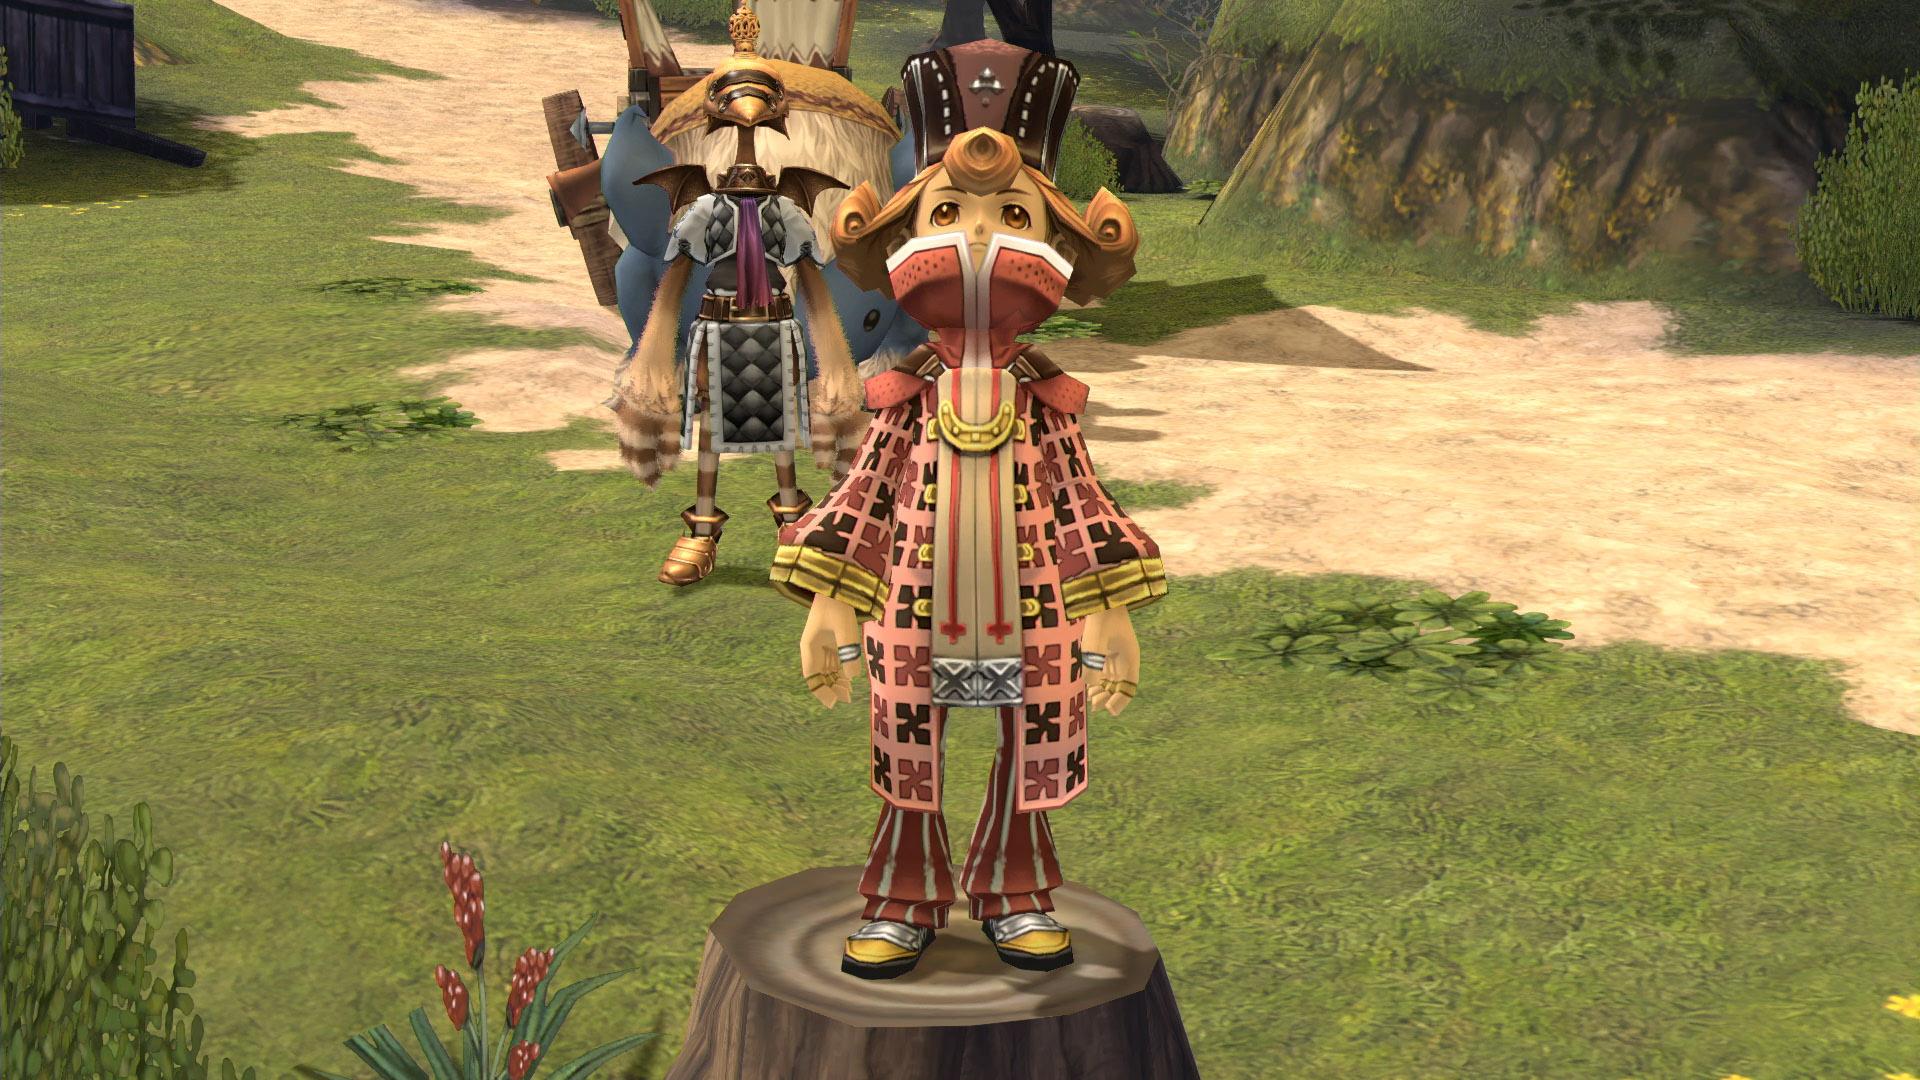 final fantasy crystal chronicles demo (9)